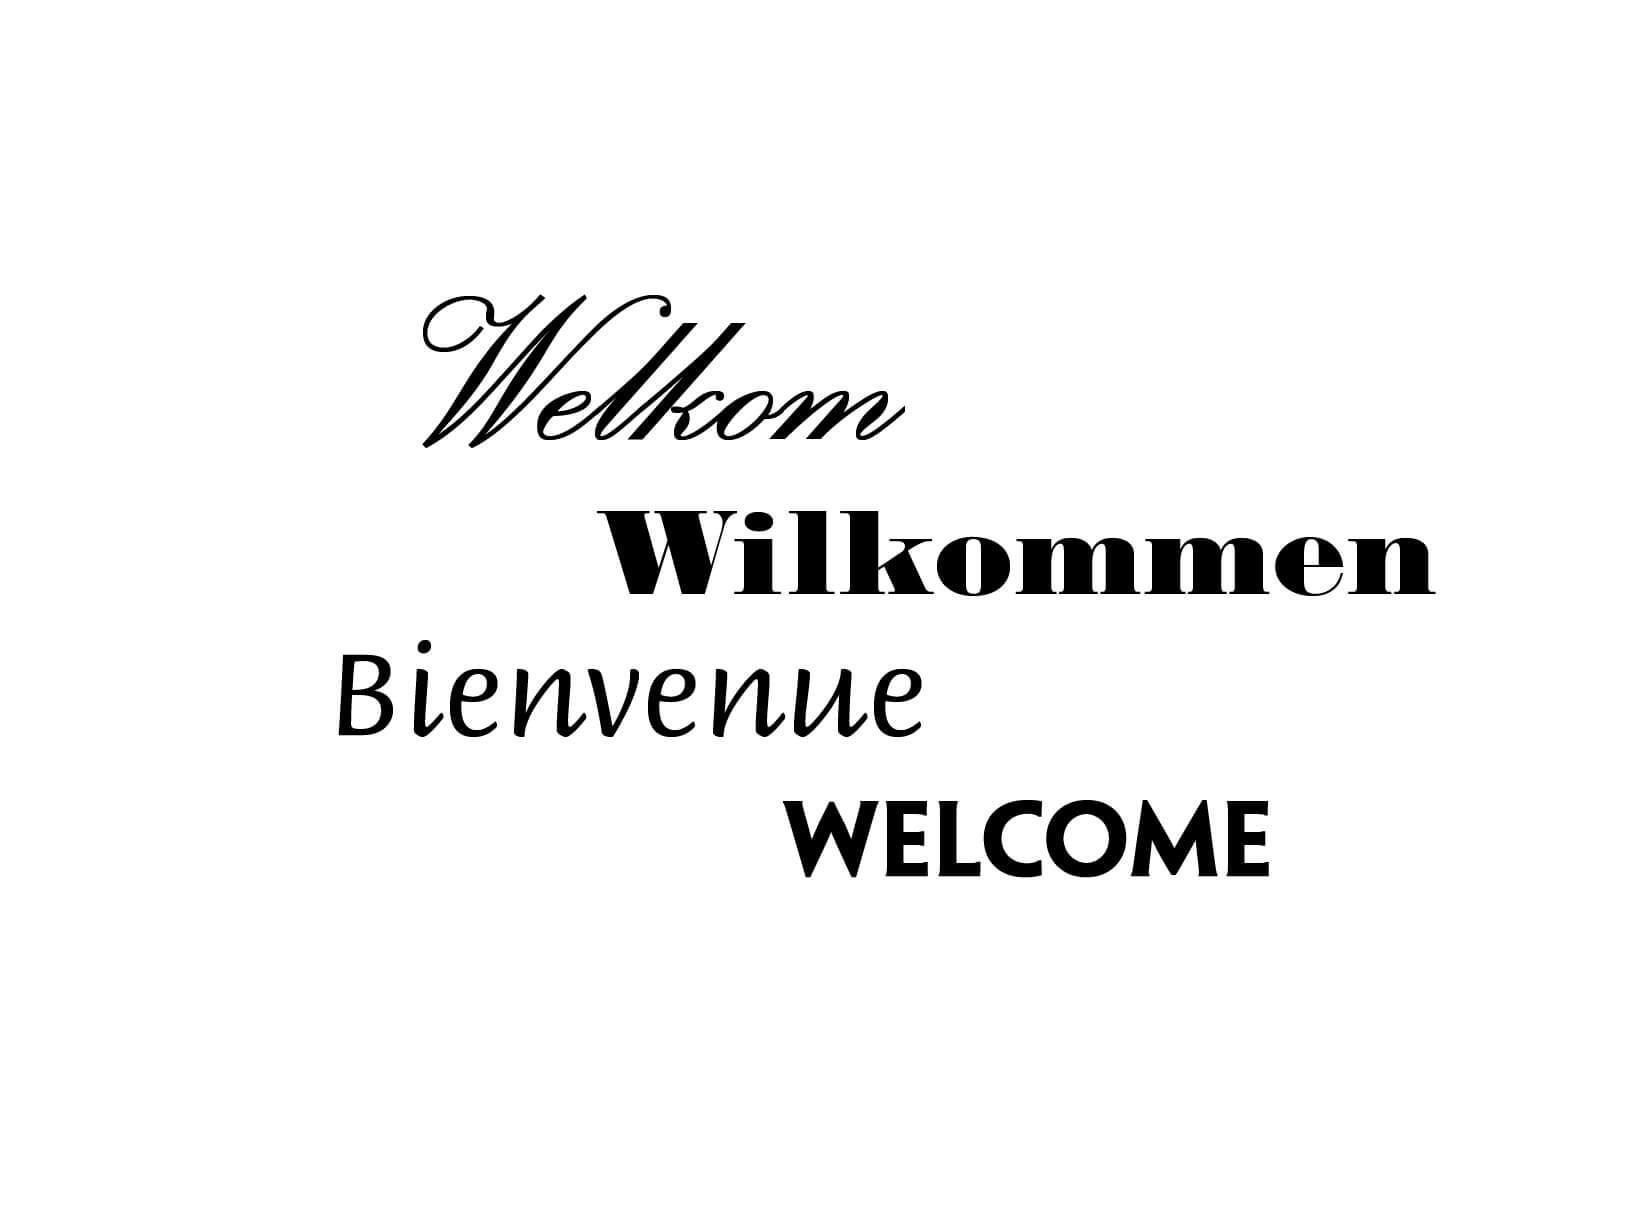 Muursticker Welkom Wilkommen Bienvenue Welcome